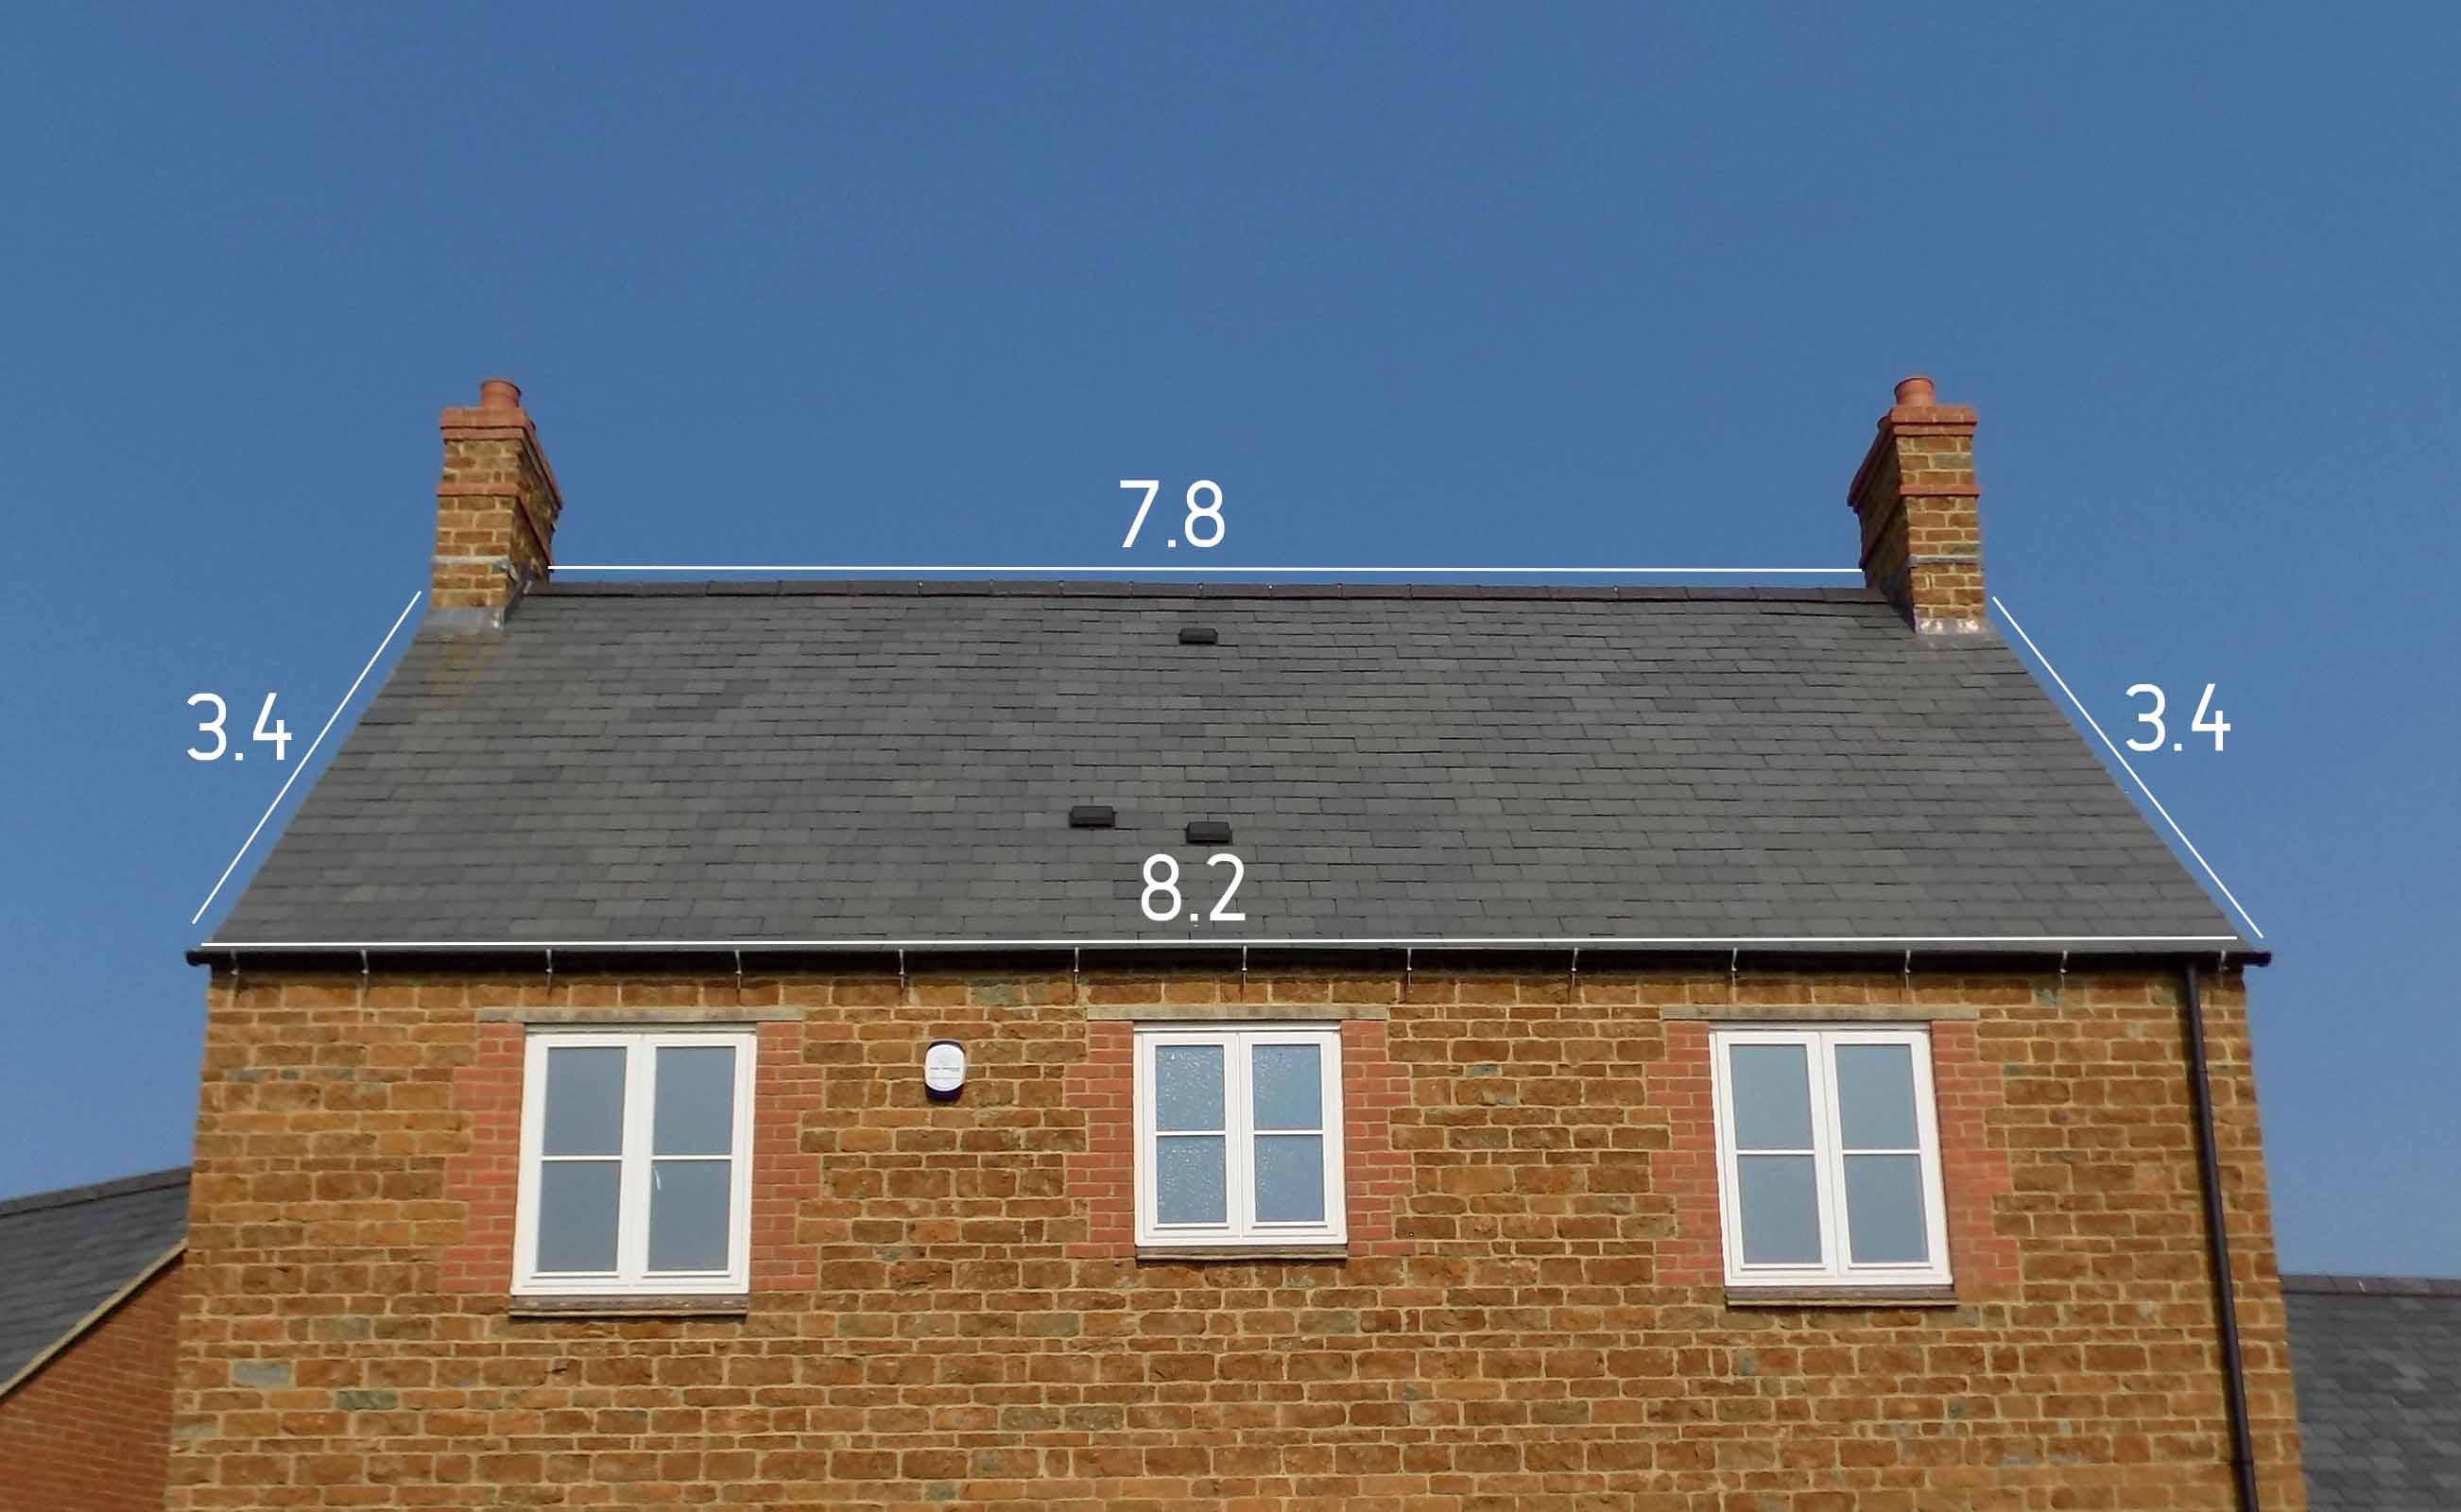 Buy Roof Slate Online Cheapest Roof Slates On The Internet